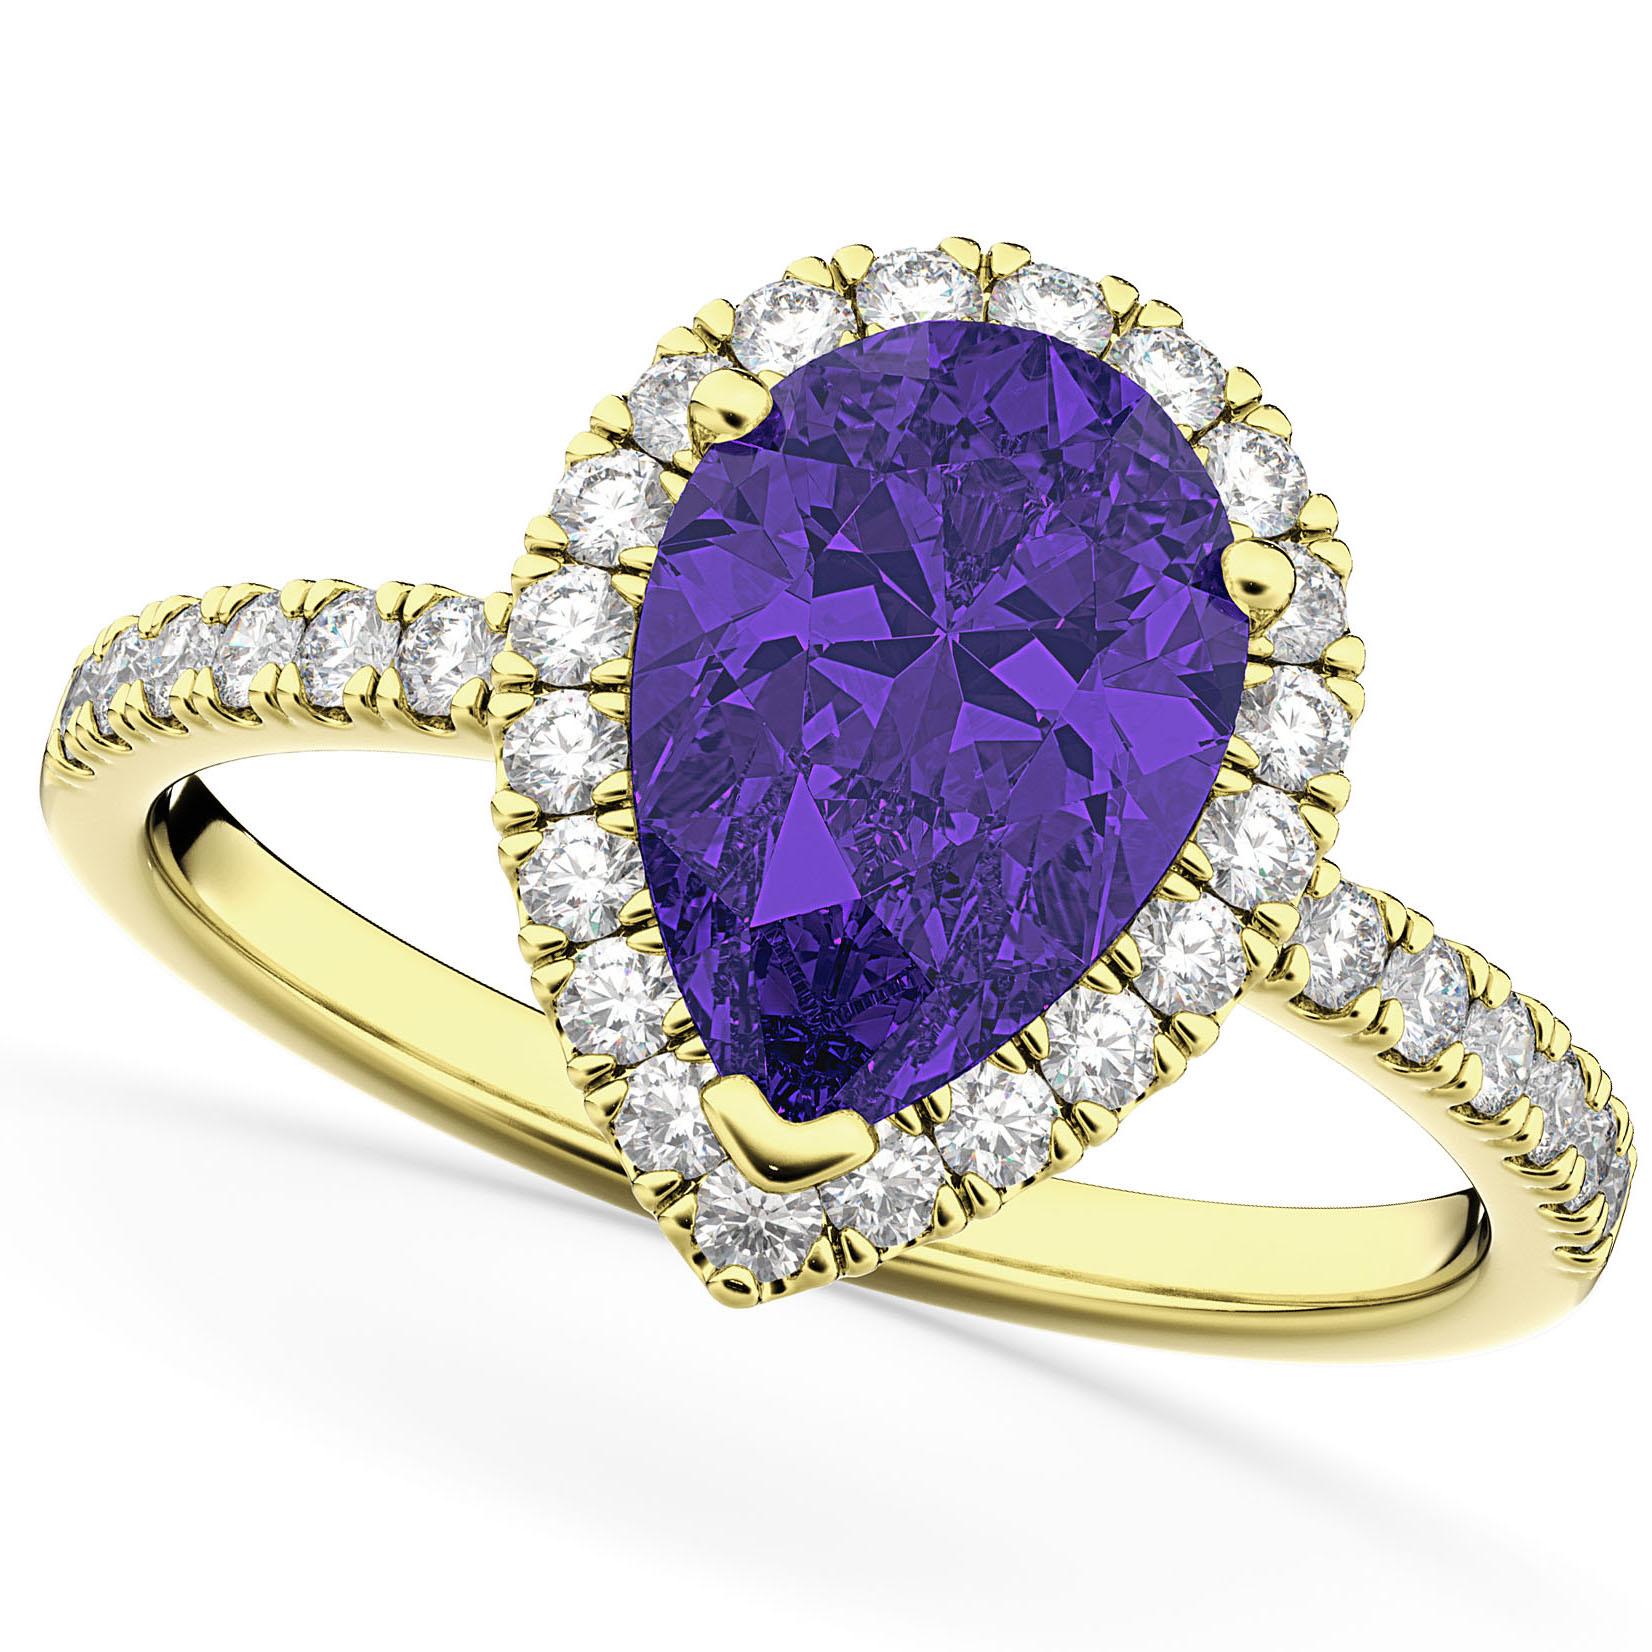 Pear Cut Halo Tanzanite & Diamond Engagement Ring 14K Yellow Gold 1.54ct